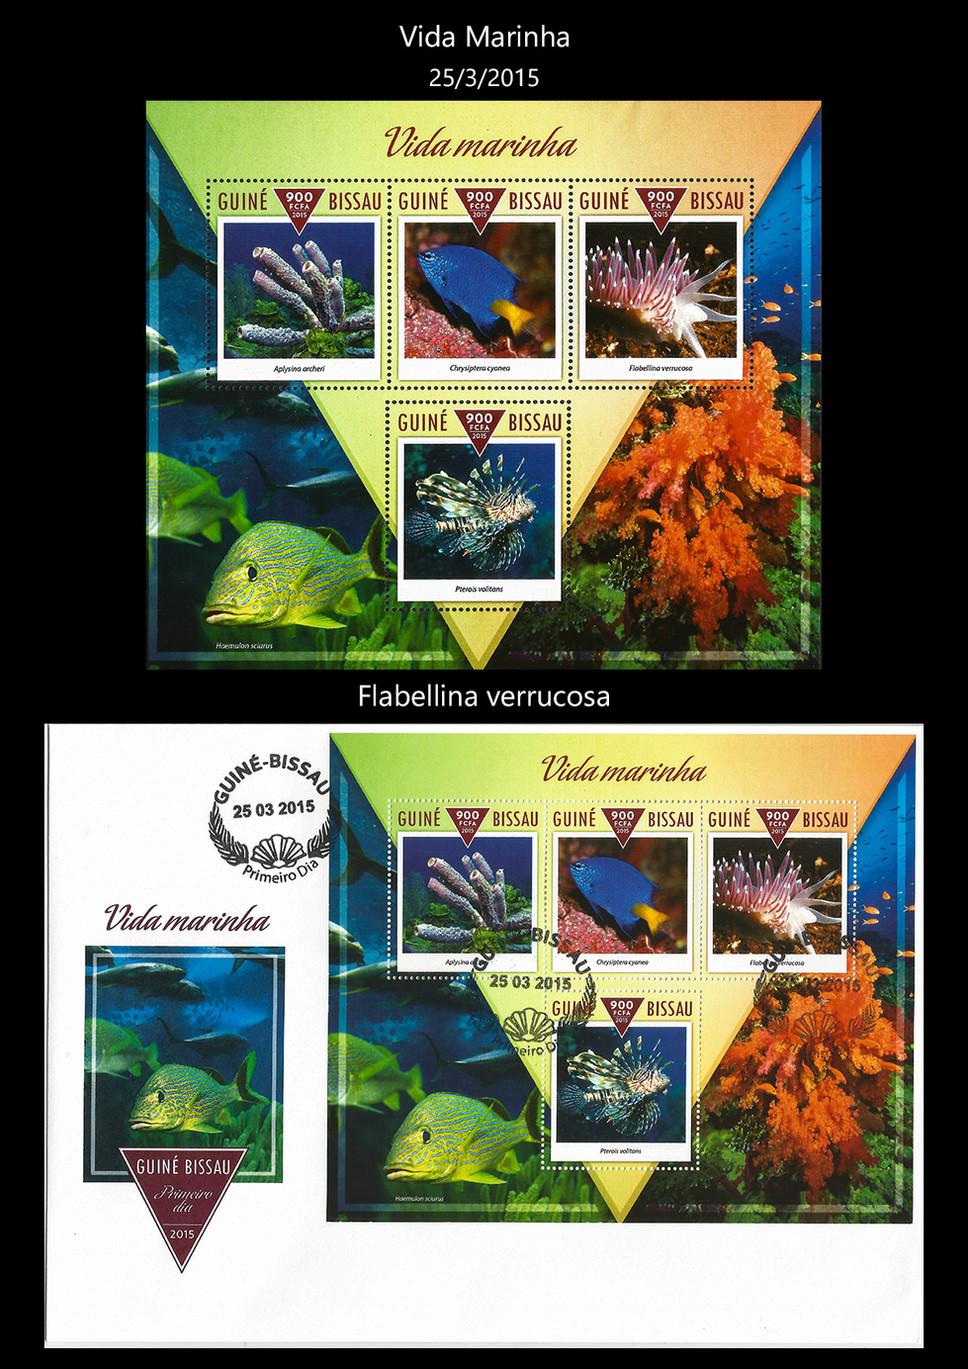 guine bissau 2015 Stamps & FDC